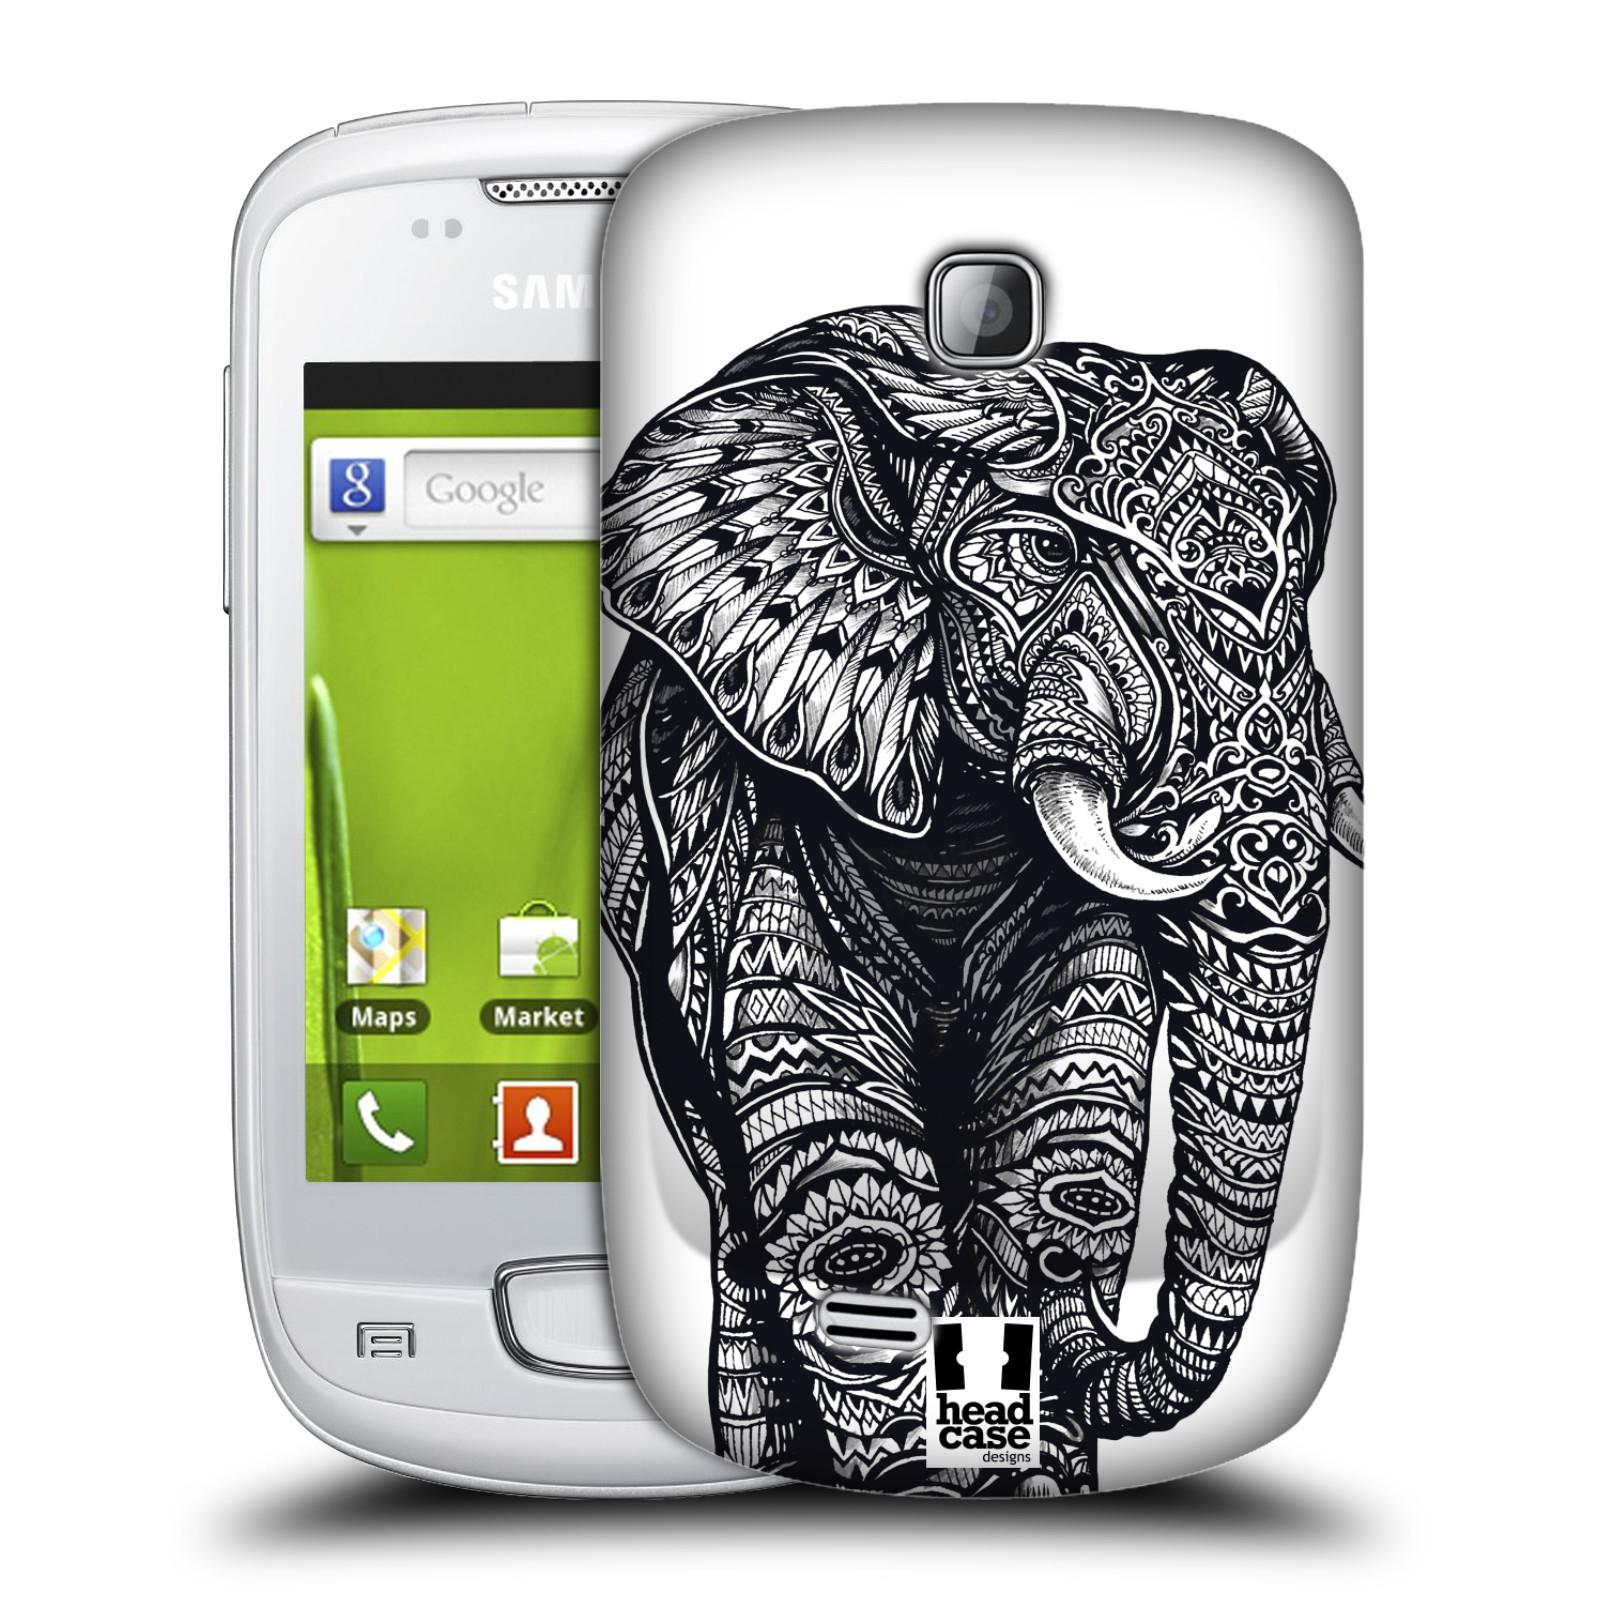 Plastové pouzdro na mobil Samsung Galaxy Mini HEAD CASE Zdobený Slon (Plastový kryt či obal na mobilní telefon Samsung Galaxy Mini GT-S5570 / GT-S5570i)